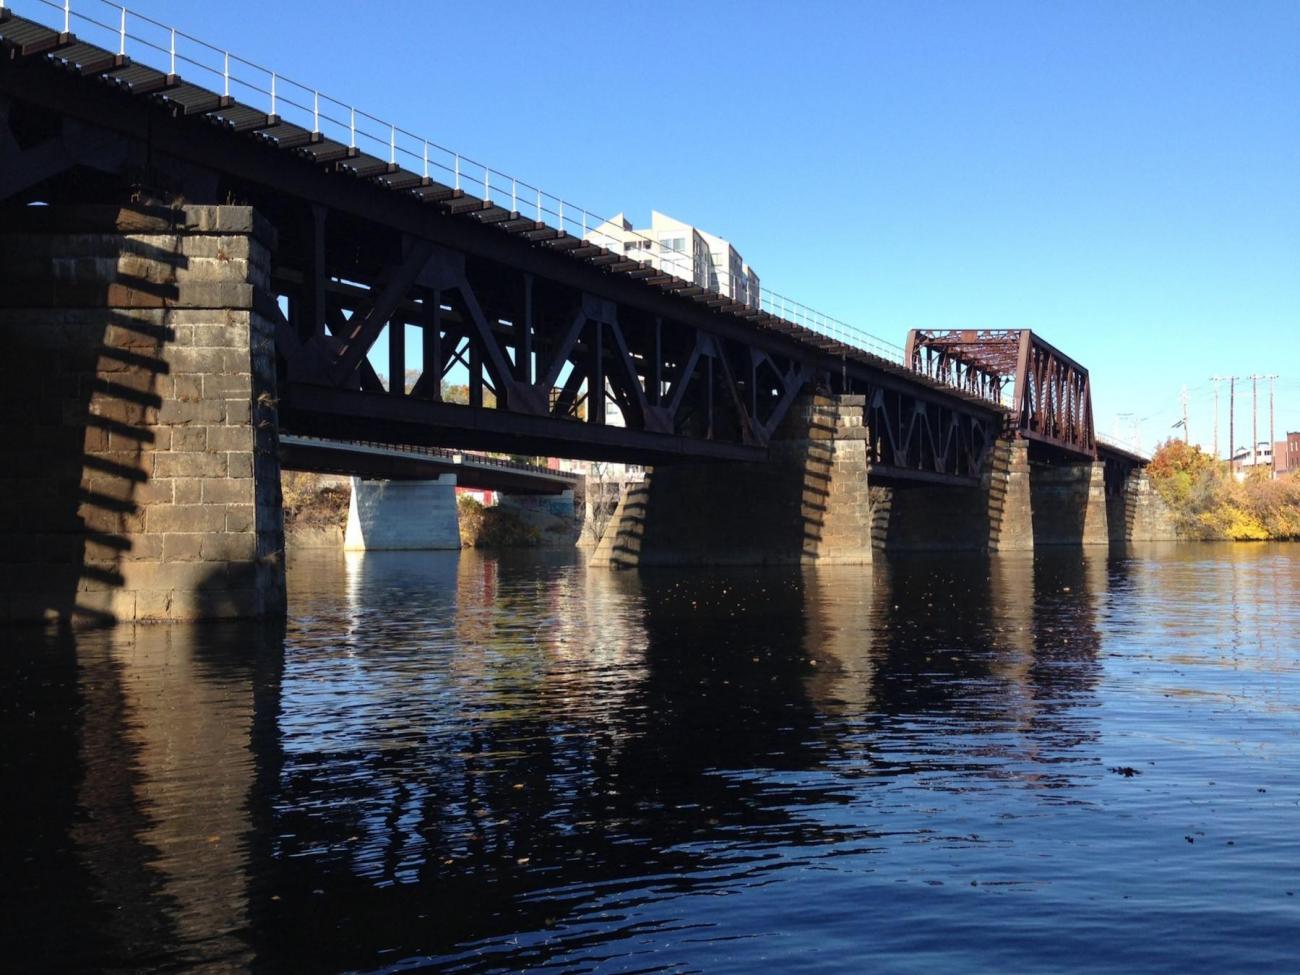 Merrimack River Bridge, viewed from below